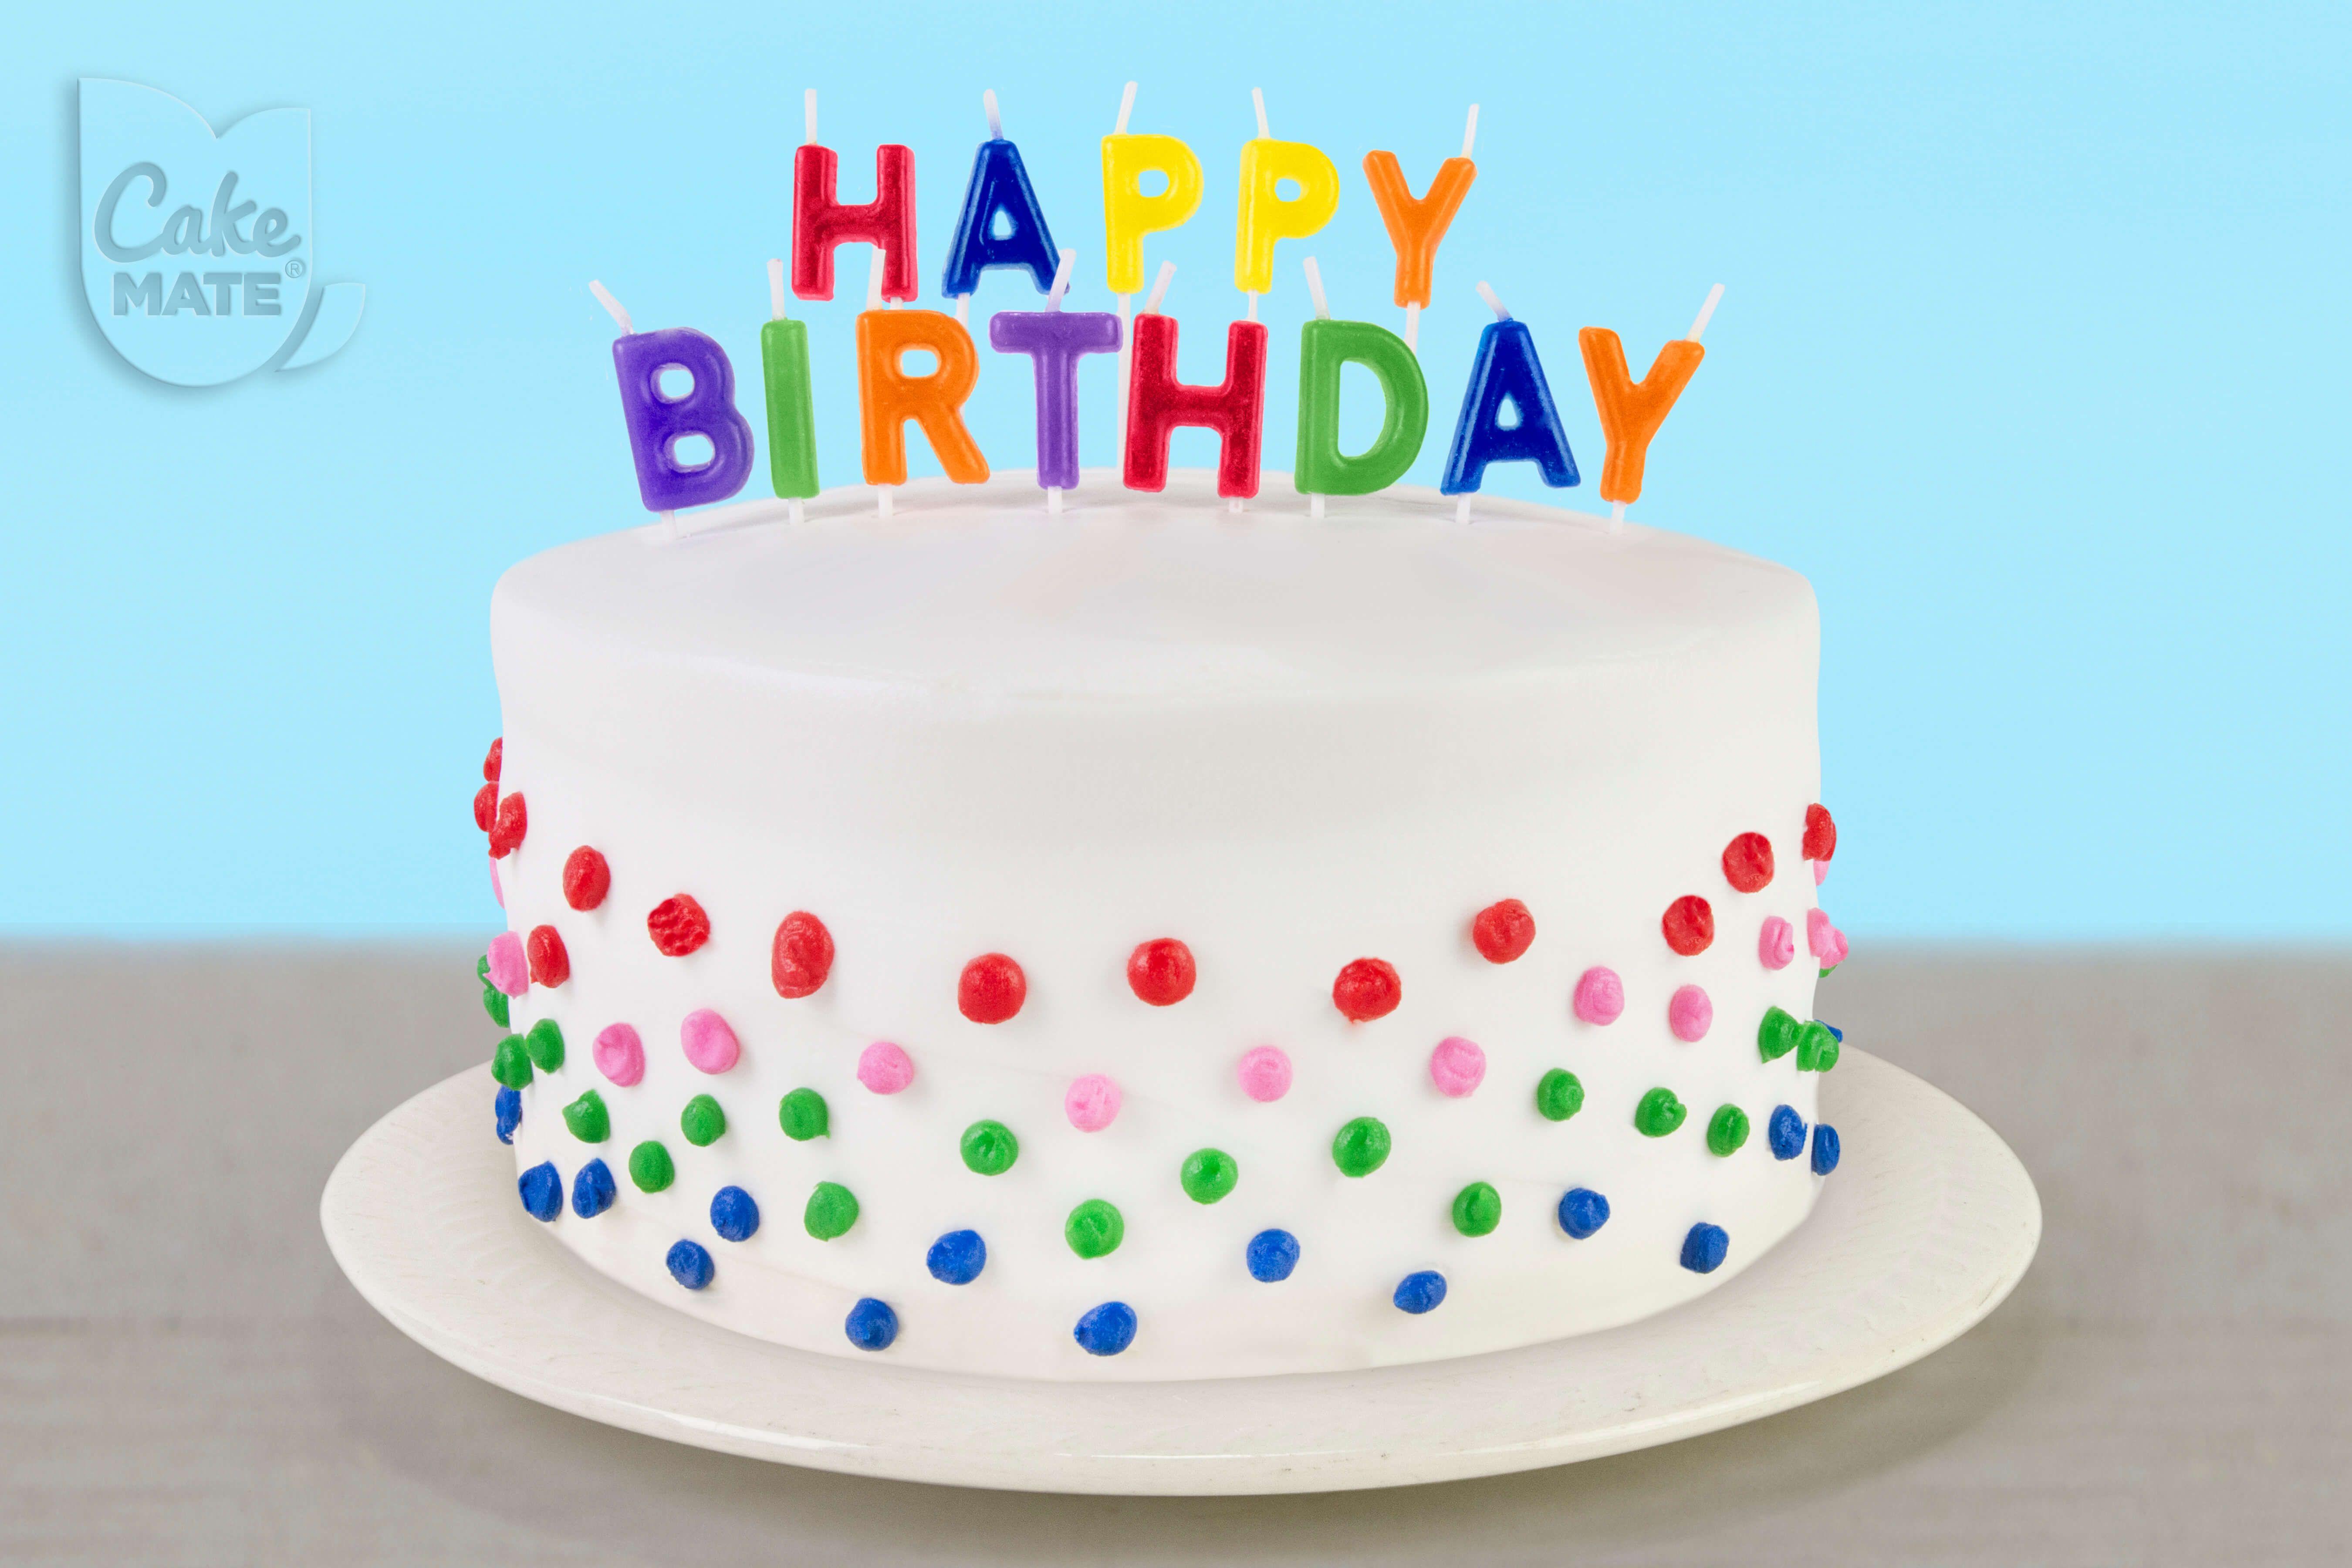 Polka Dotted Birthday Cake W Happy Birthday Candles Easy Cake Cake Mix Ingredients Polka Dot Cakes